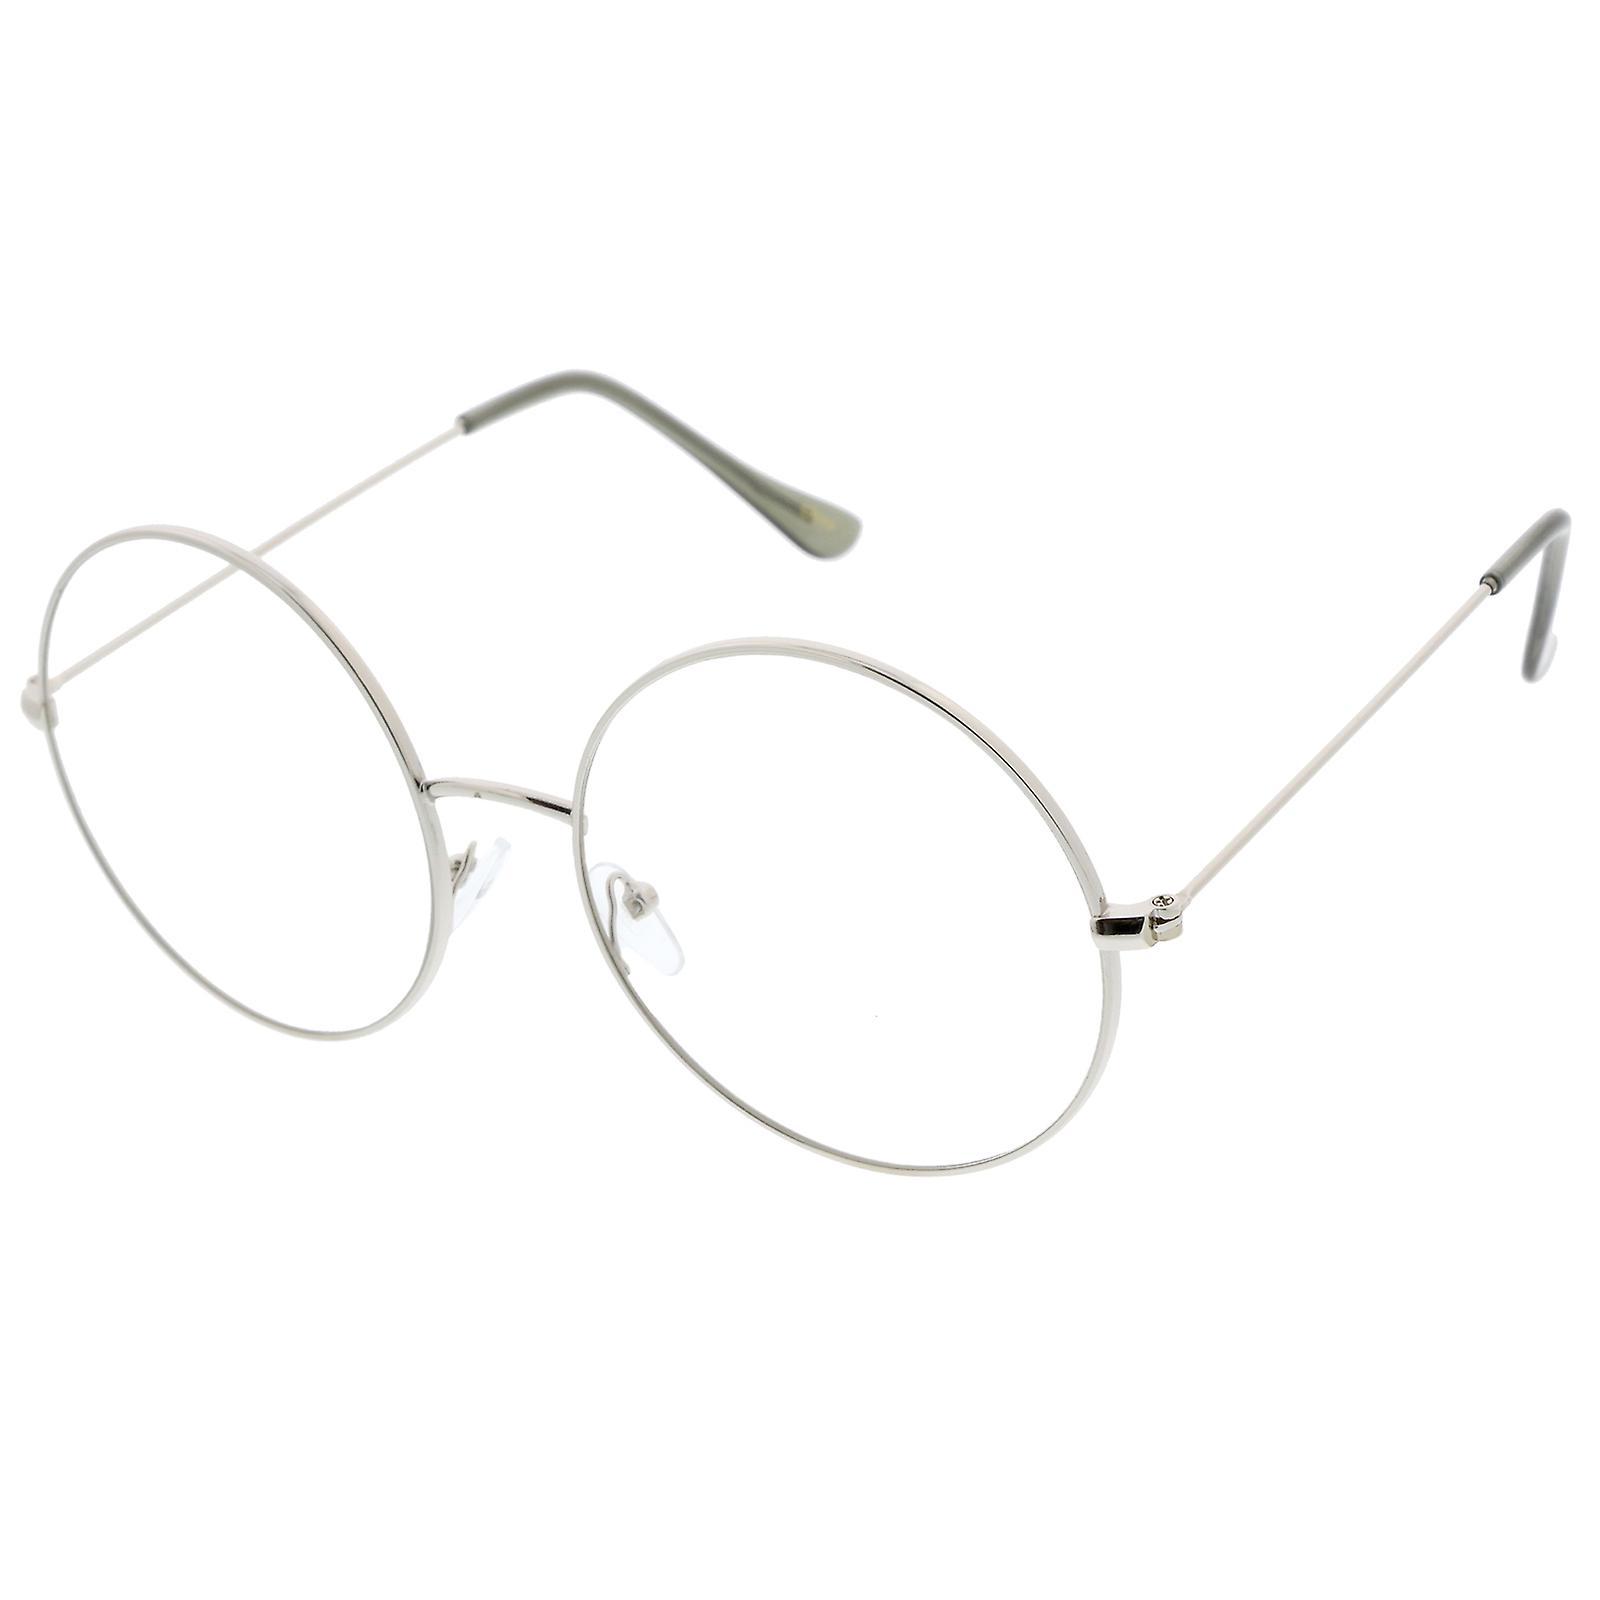 fc15695877 Classic Oversize Slim Metal Frame Clear Flat Lens Round Eyeglasses 56mm